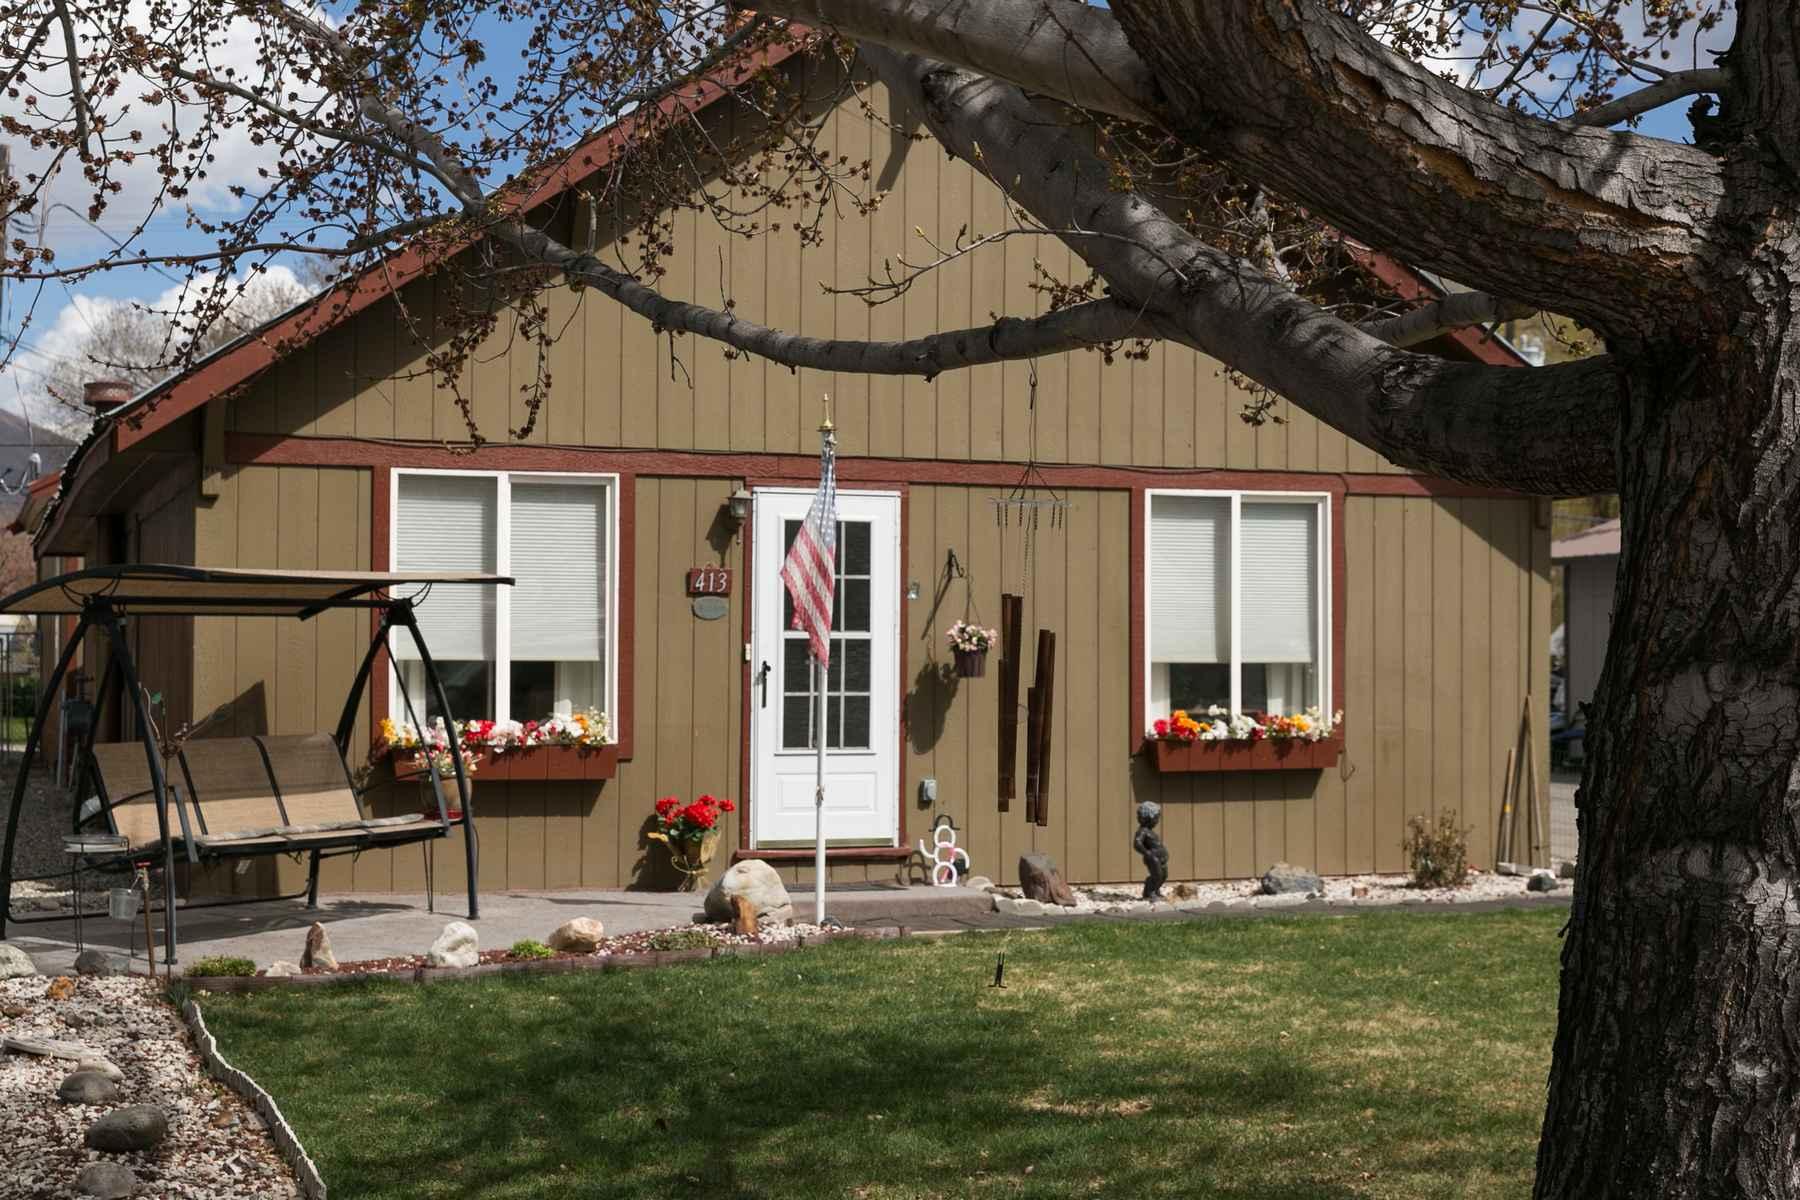 Moradia para Venda às Endless Potential Bellevue Home 413 S. Main St Bellevue, Idaho, 83333 Estados Unidos